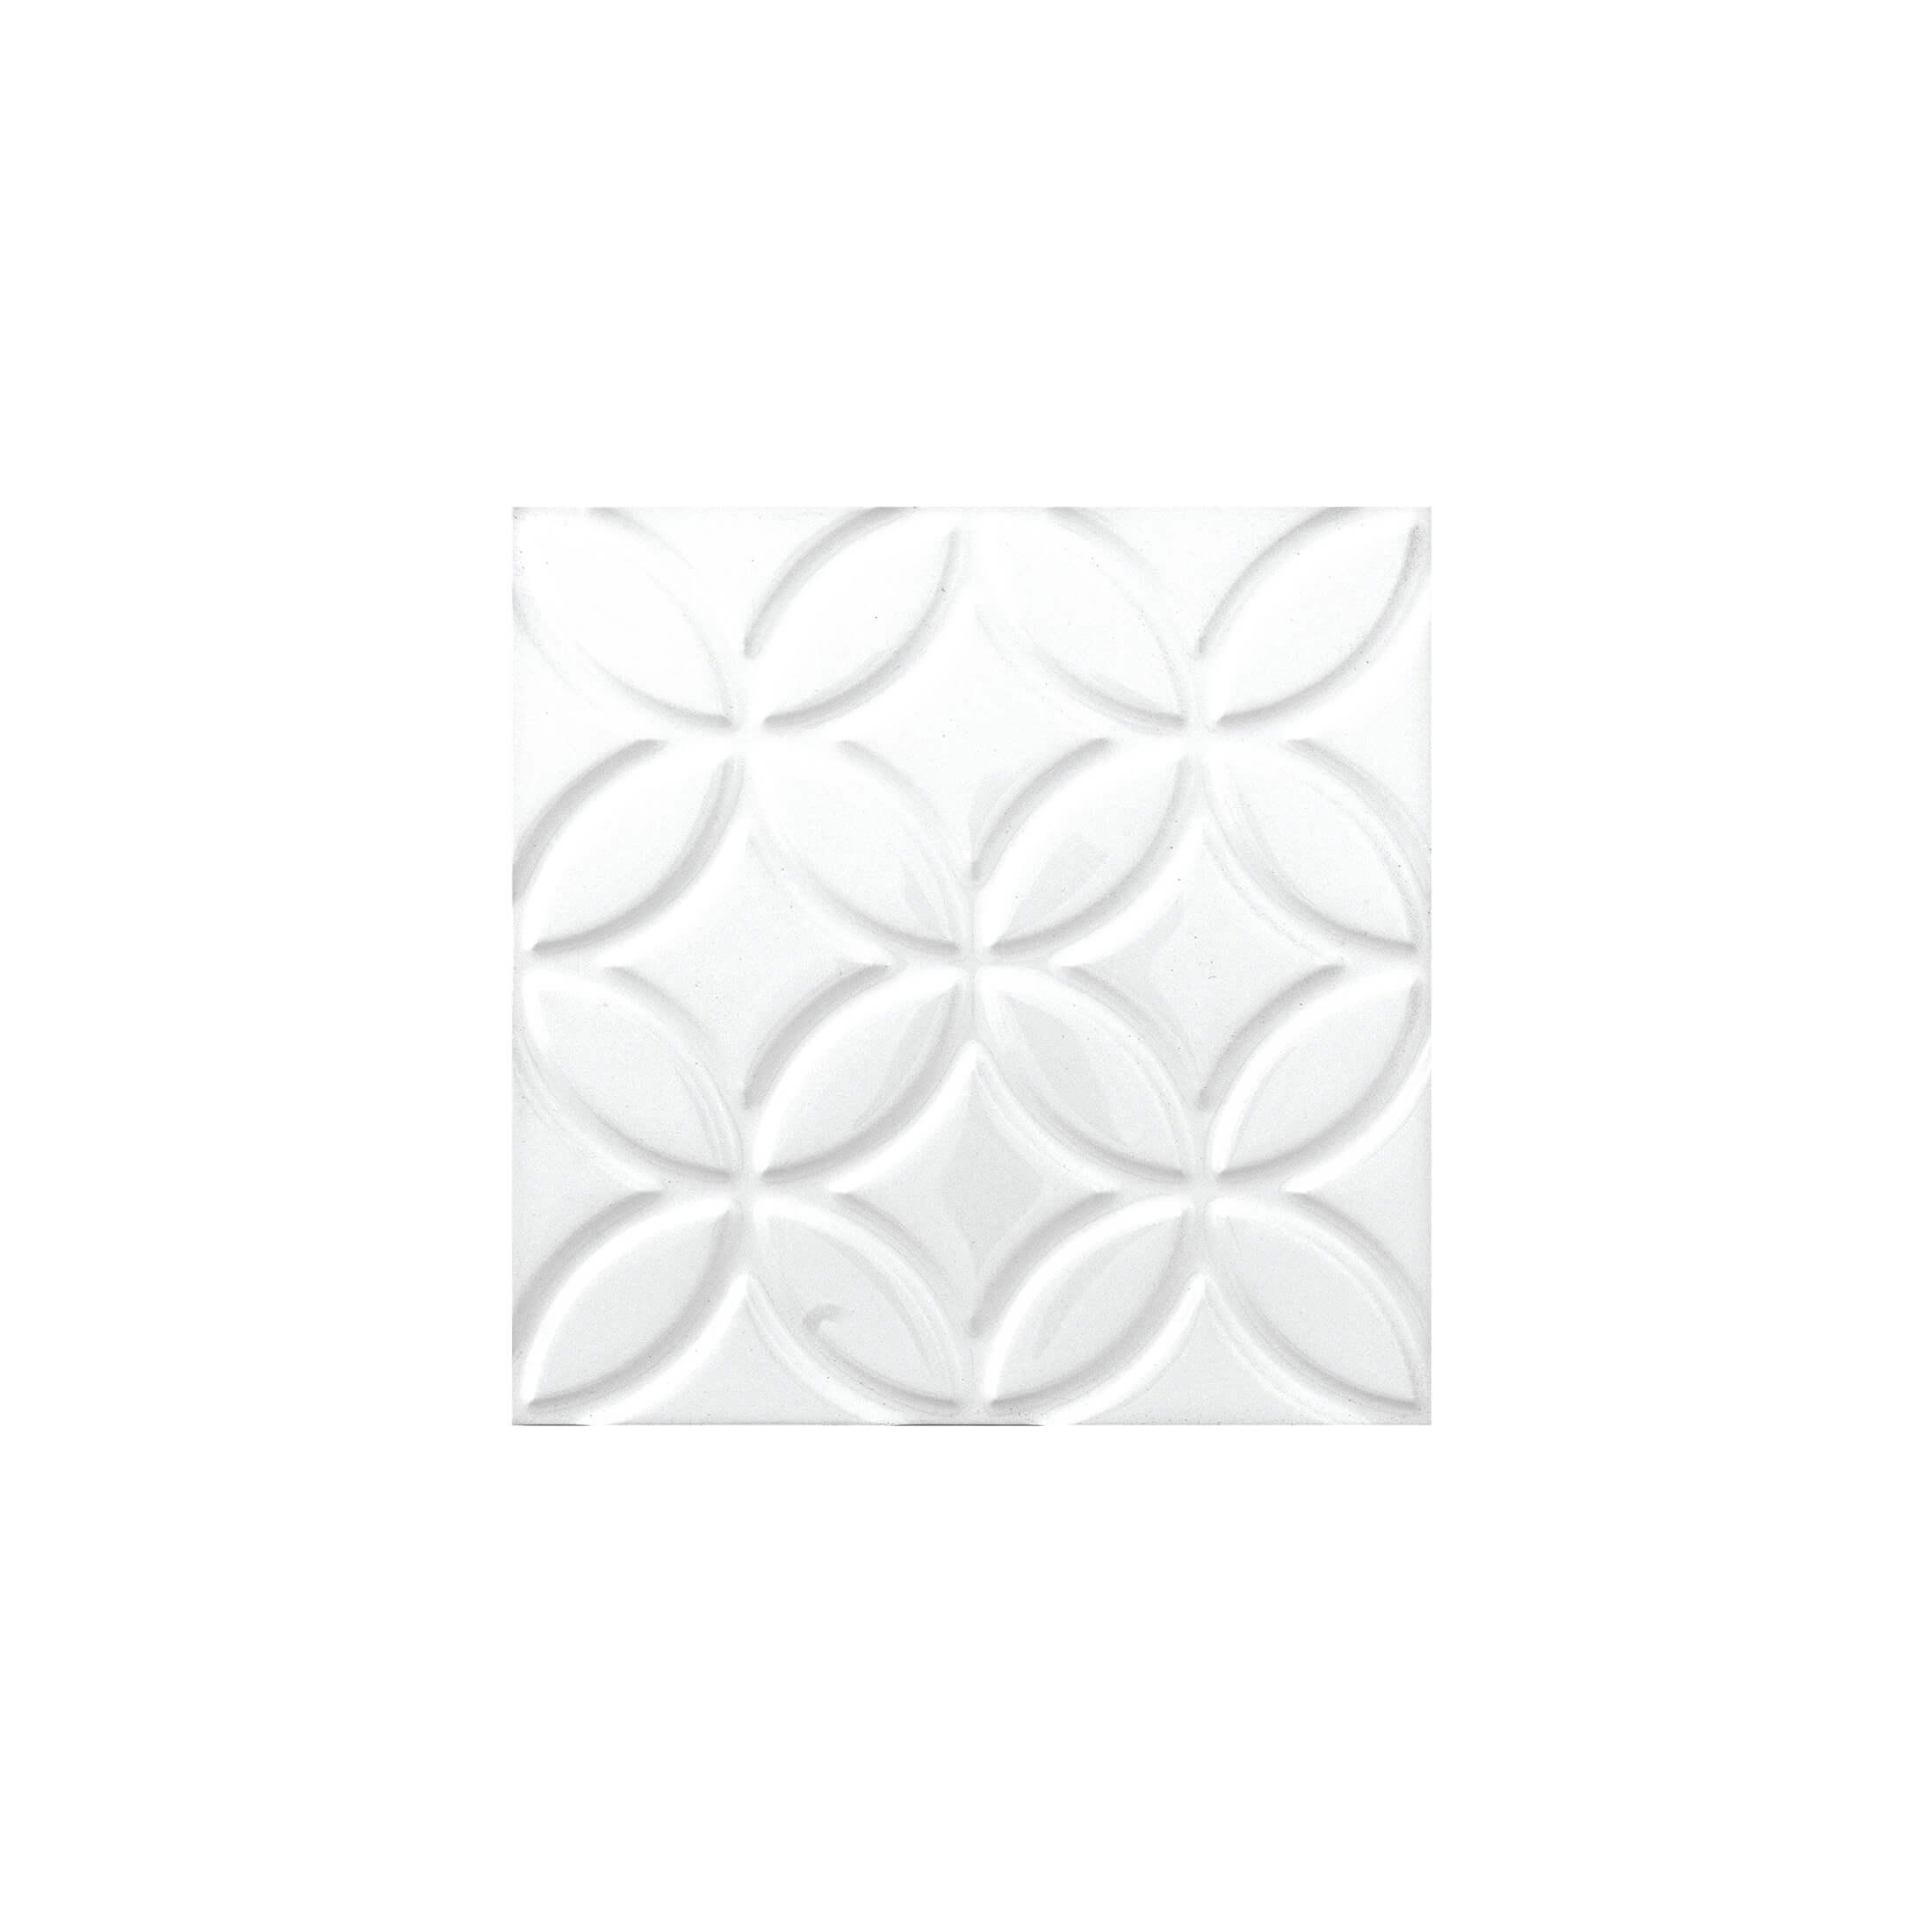 ADNE4125 - LISO BOTANICAL - 15 cm X 15 cm